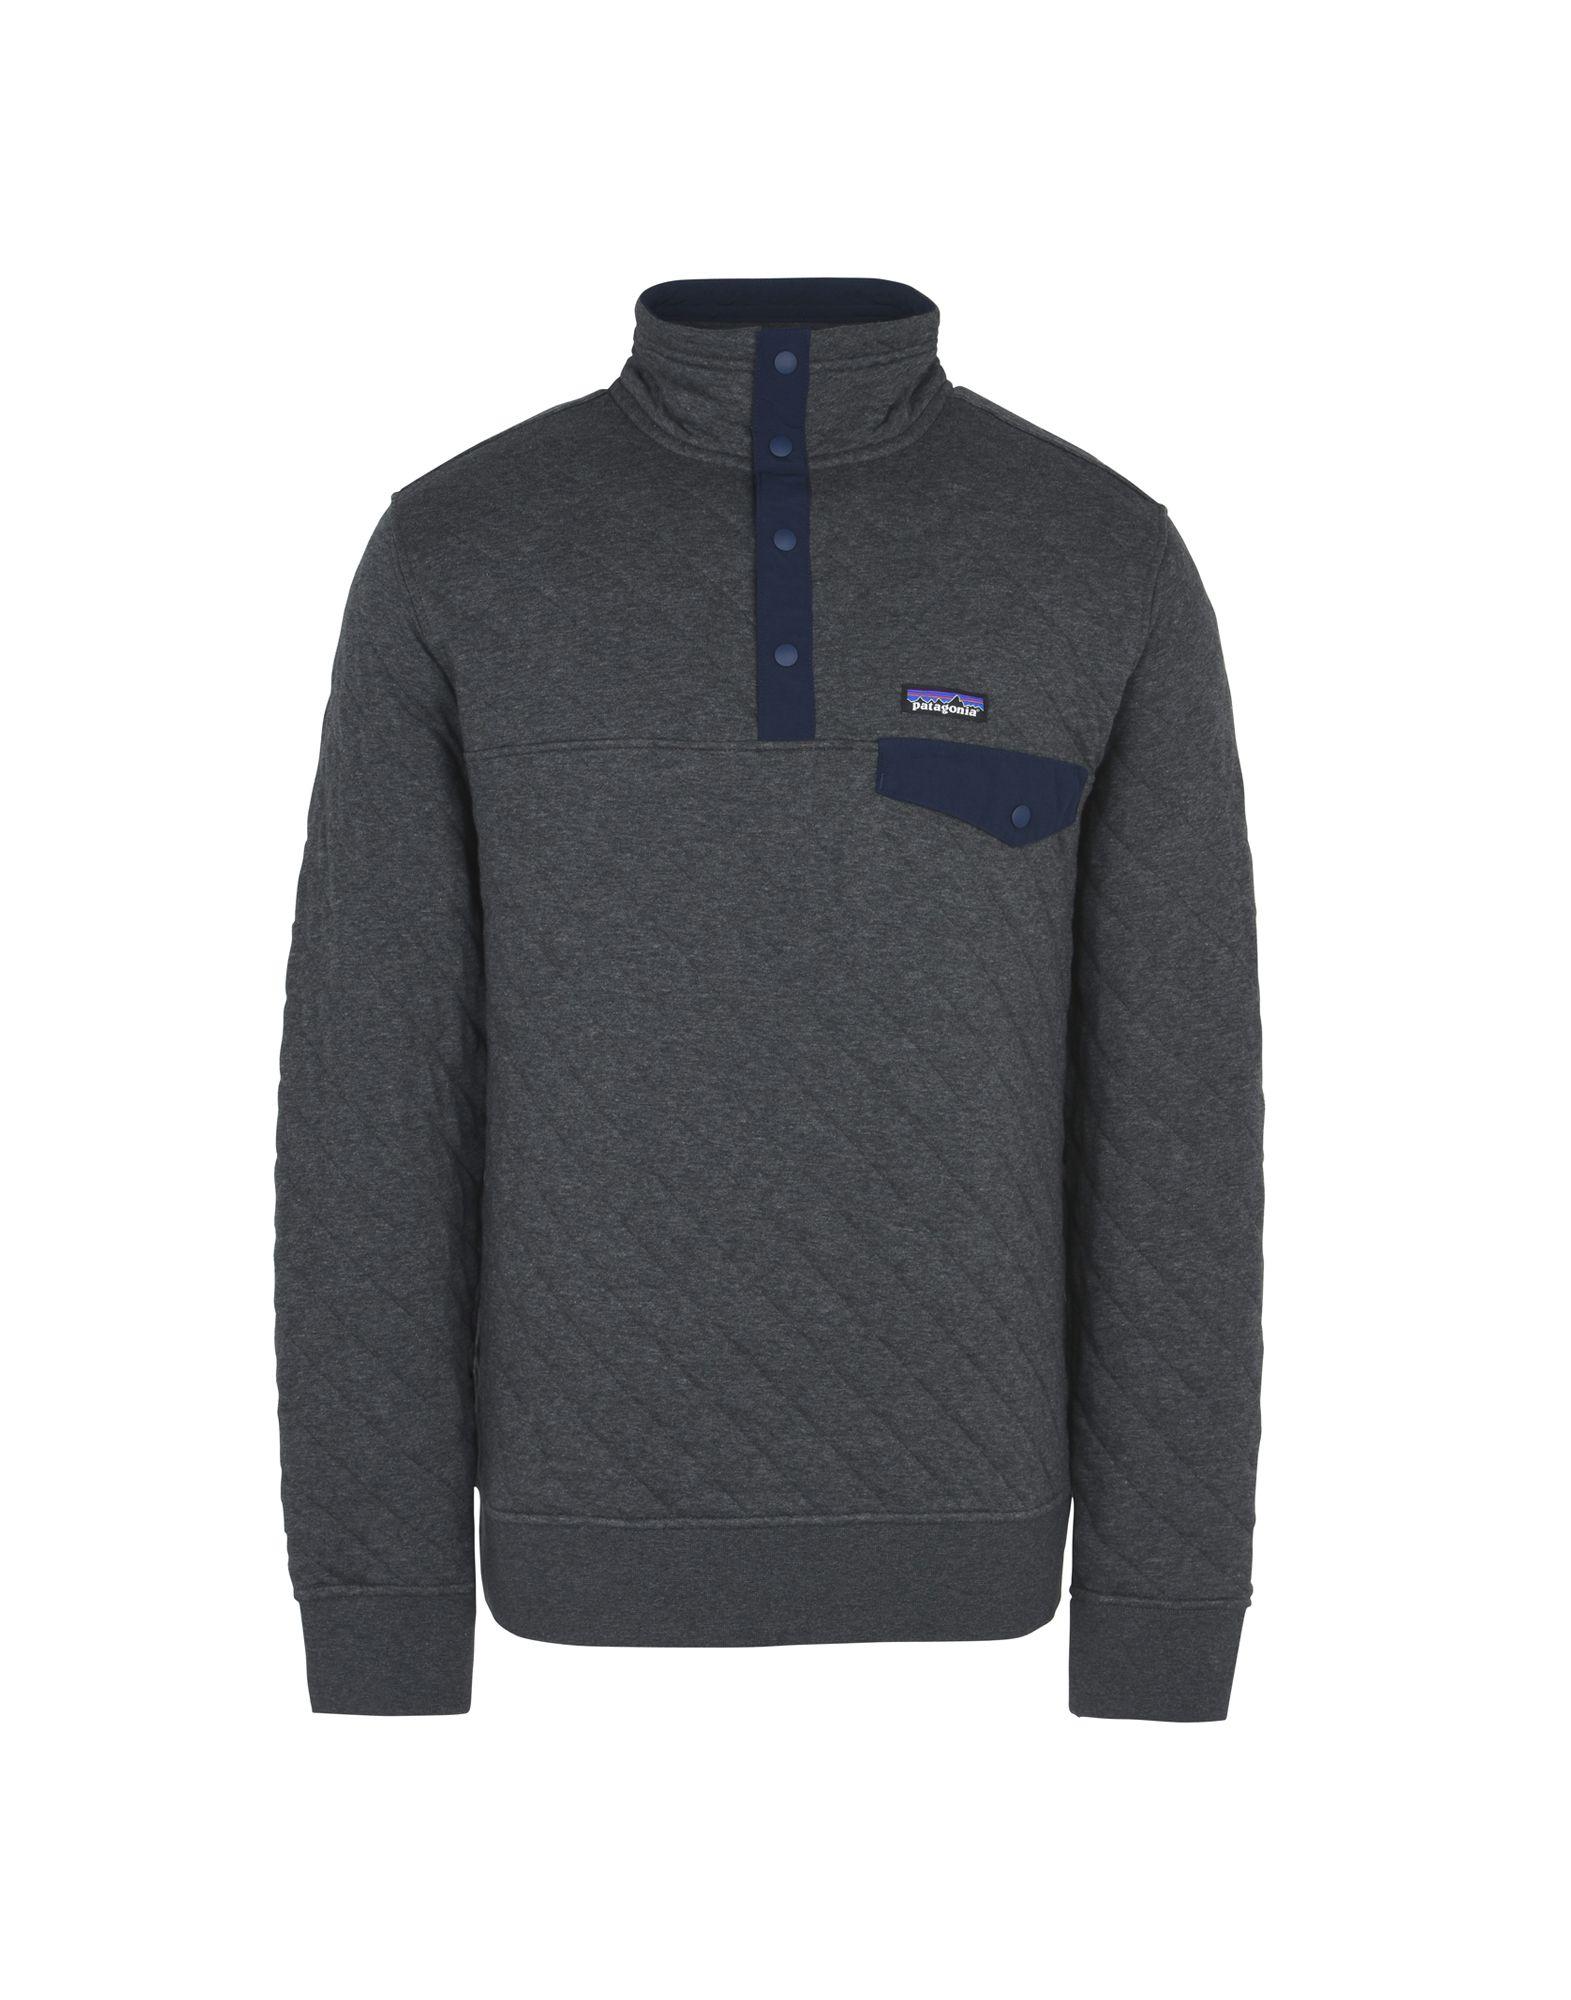 Felpa Patagonia Ms Cotton Quilt Snap-T Pullover - Uomo - Acquista online su